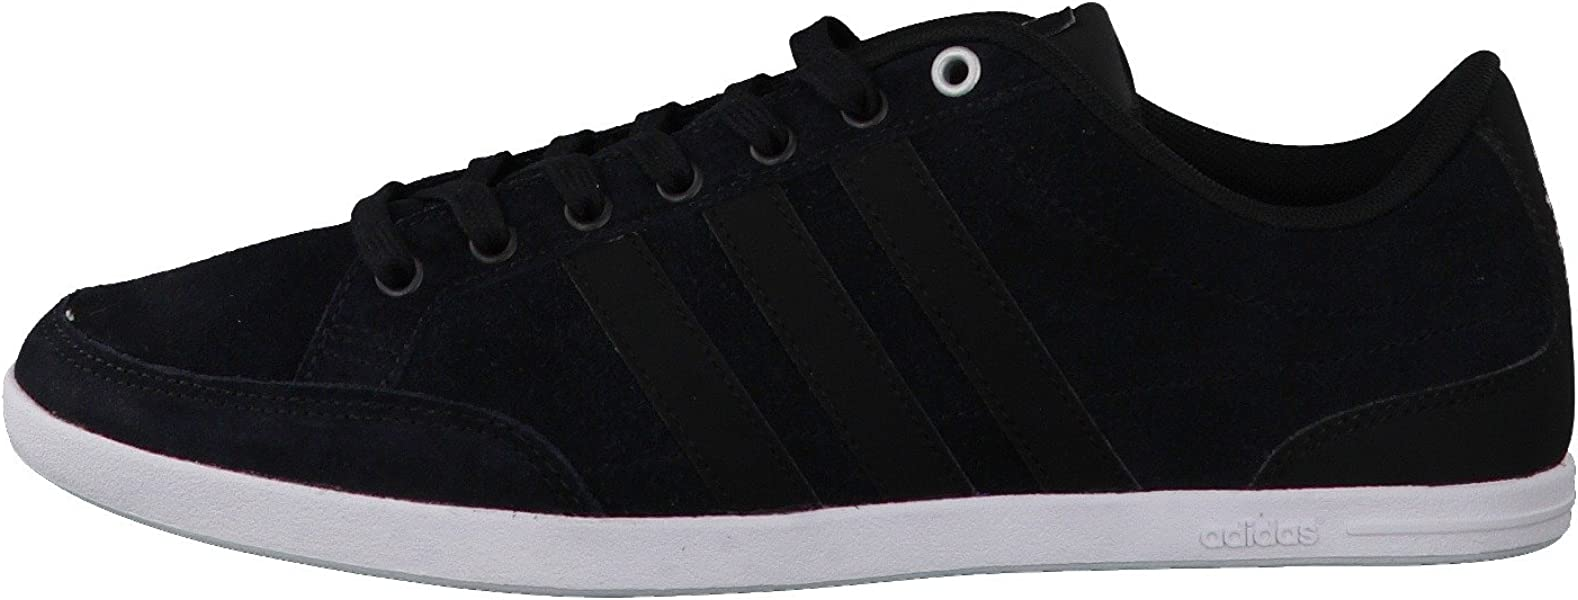 Caflaire Silver Herren Adidas Blackmatte 49 13 Sneaker Core Blackcore qMVpSUz